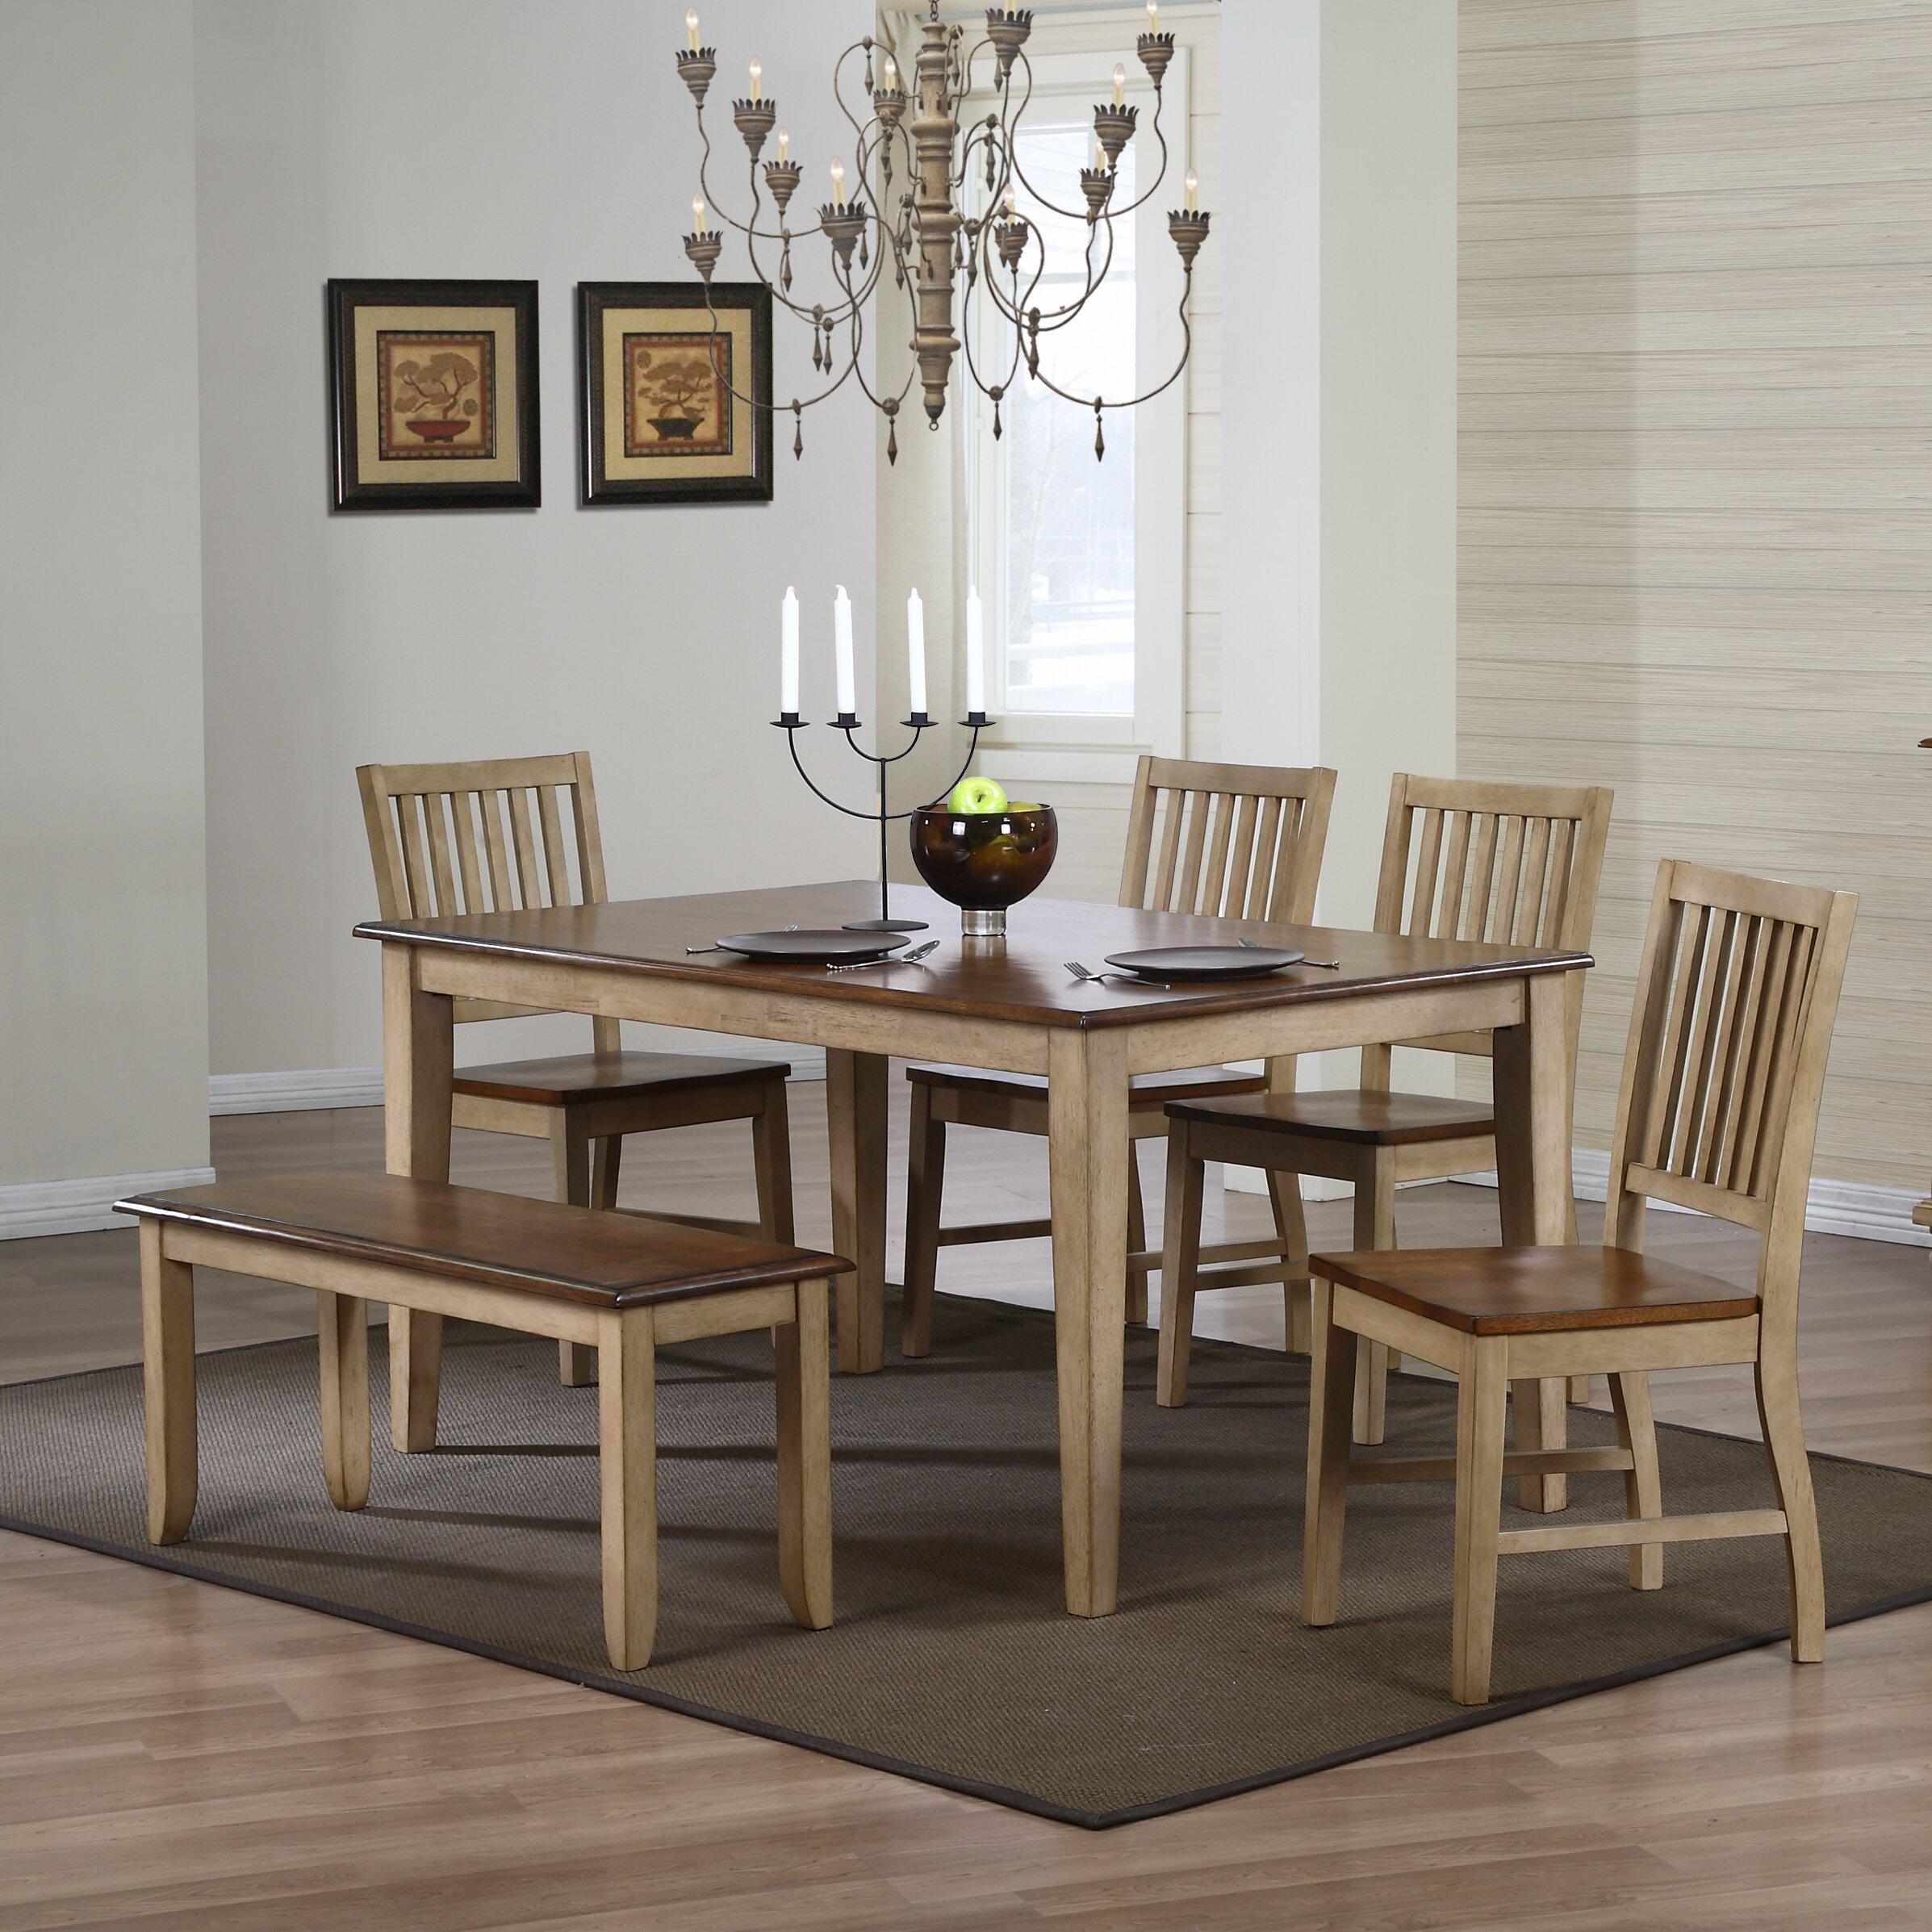 Sunset trading brook 6 piece dining set reviews wayfair for Dining room sets 6 piece